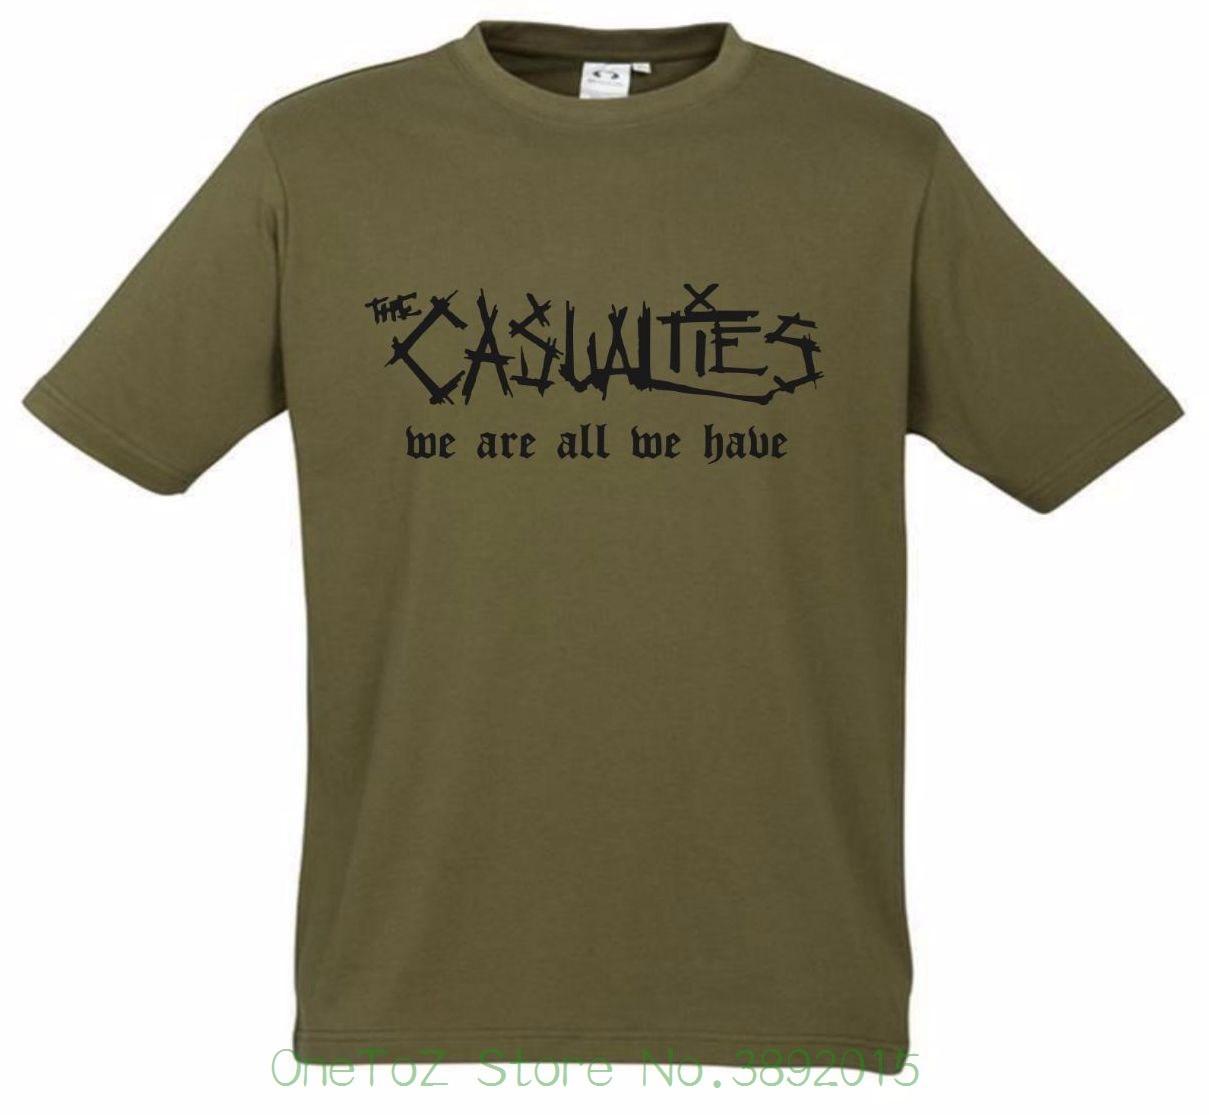 2018 Новый Для мужчин футболка потери футболка новый хаки Редкие футболка S-XXL улица панк хардкор рок